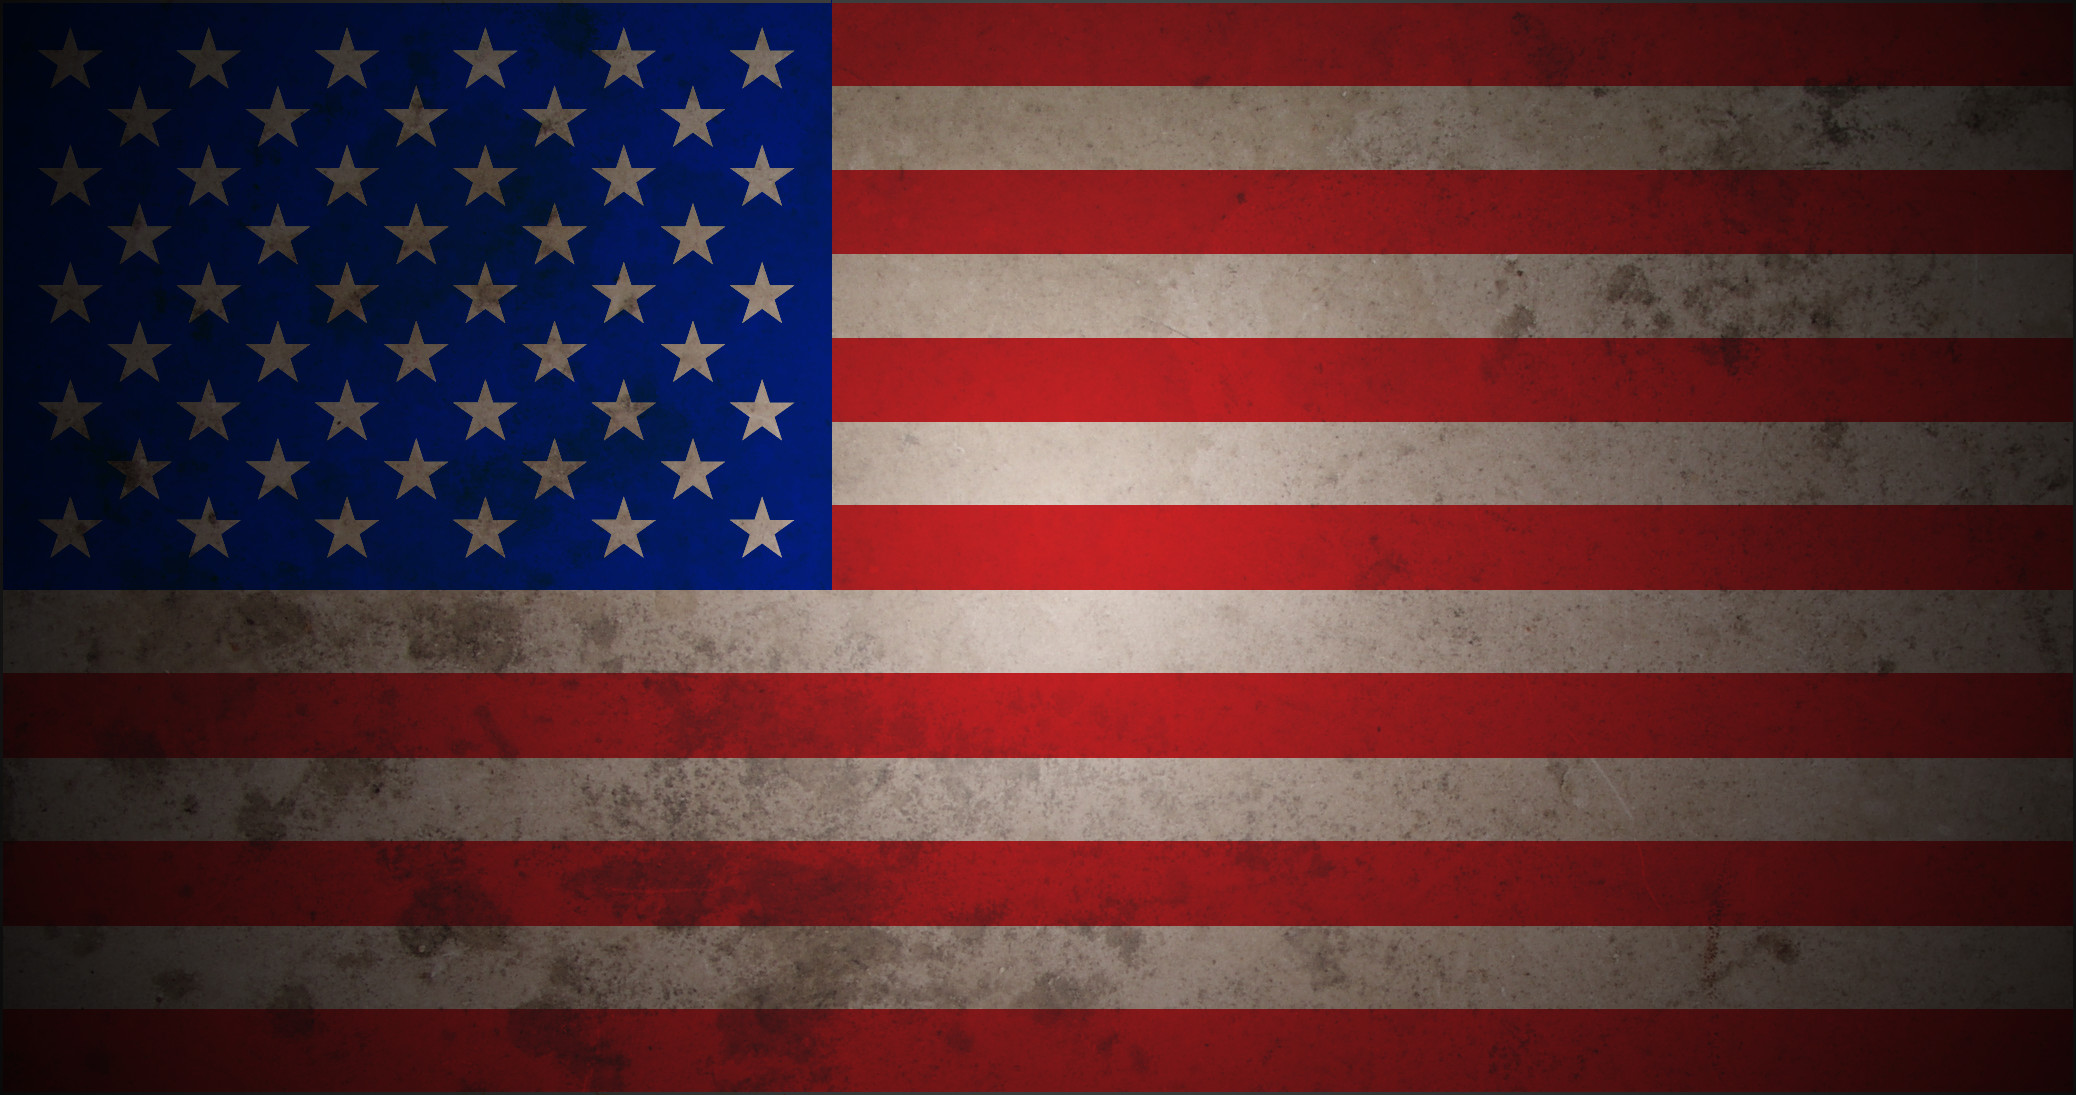 flags_usa_american_flag_desktop_2076x1095_hd-wallpaper-157877.png